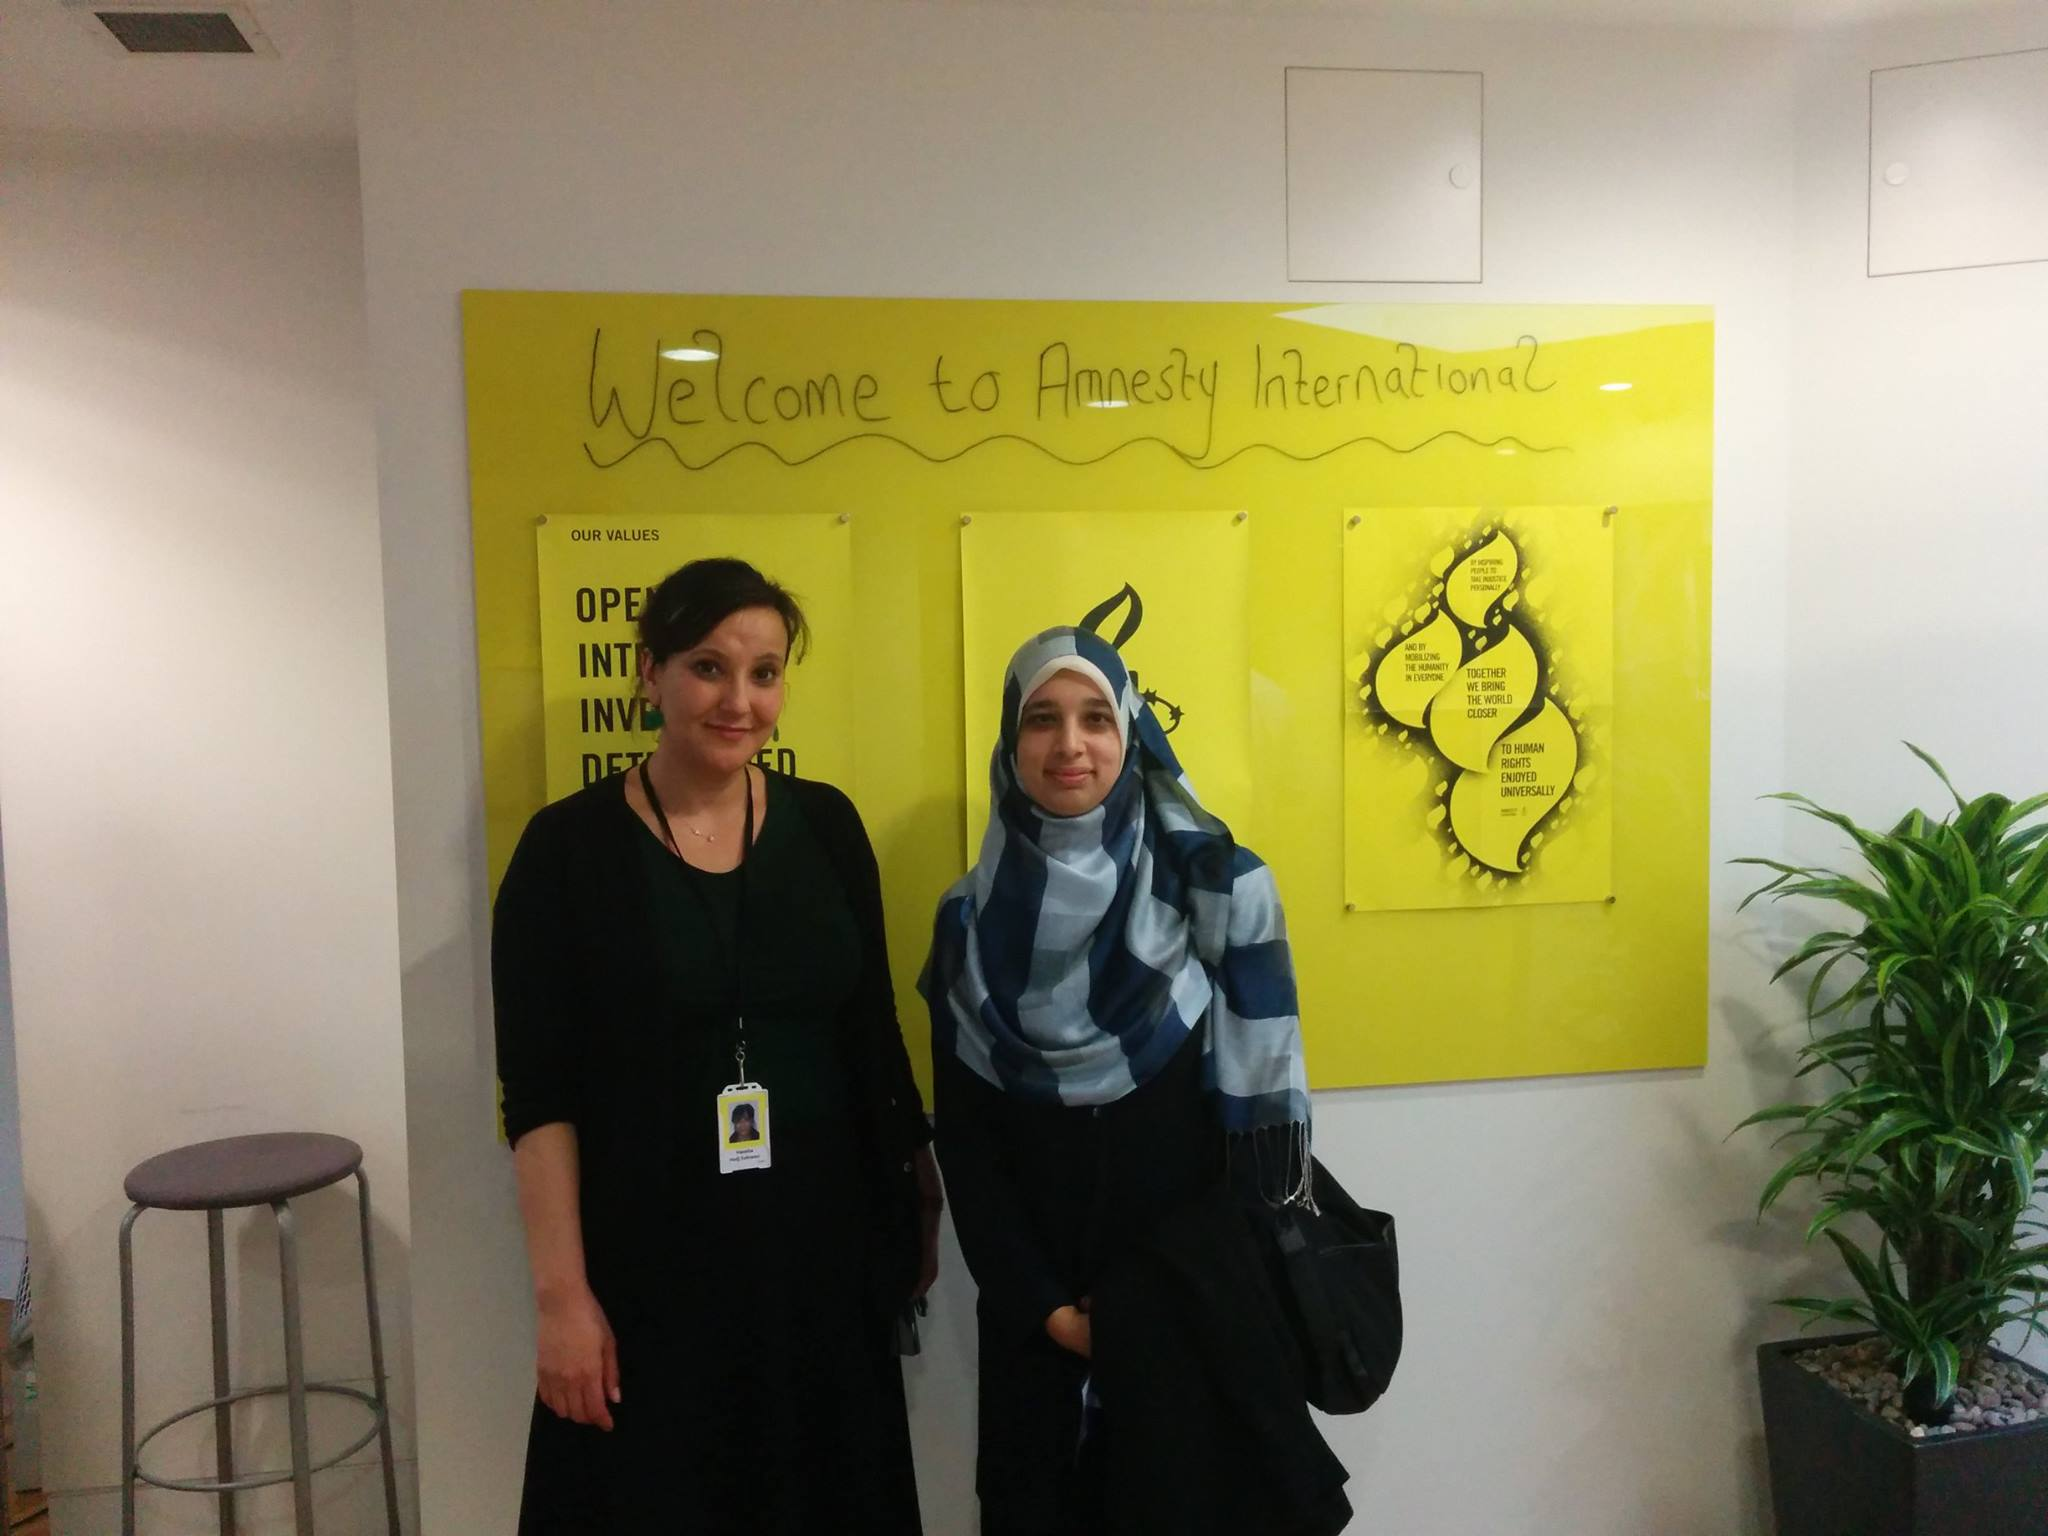 Hassiba Hadj- Sahraoui Deputy Director for MENA at Amnesty International